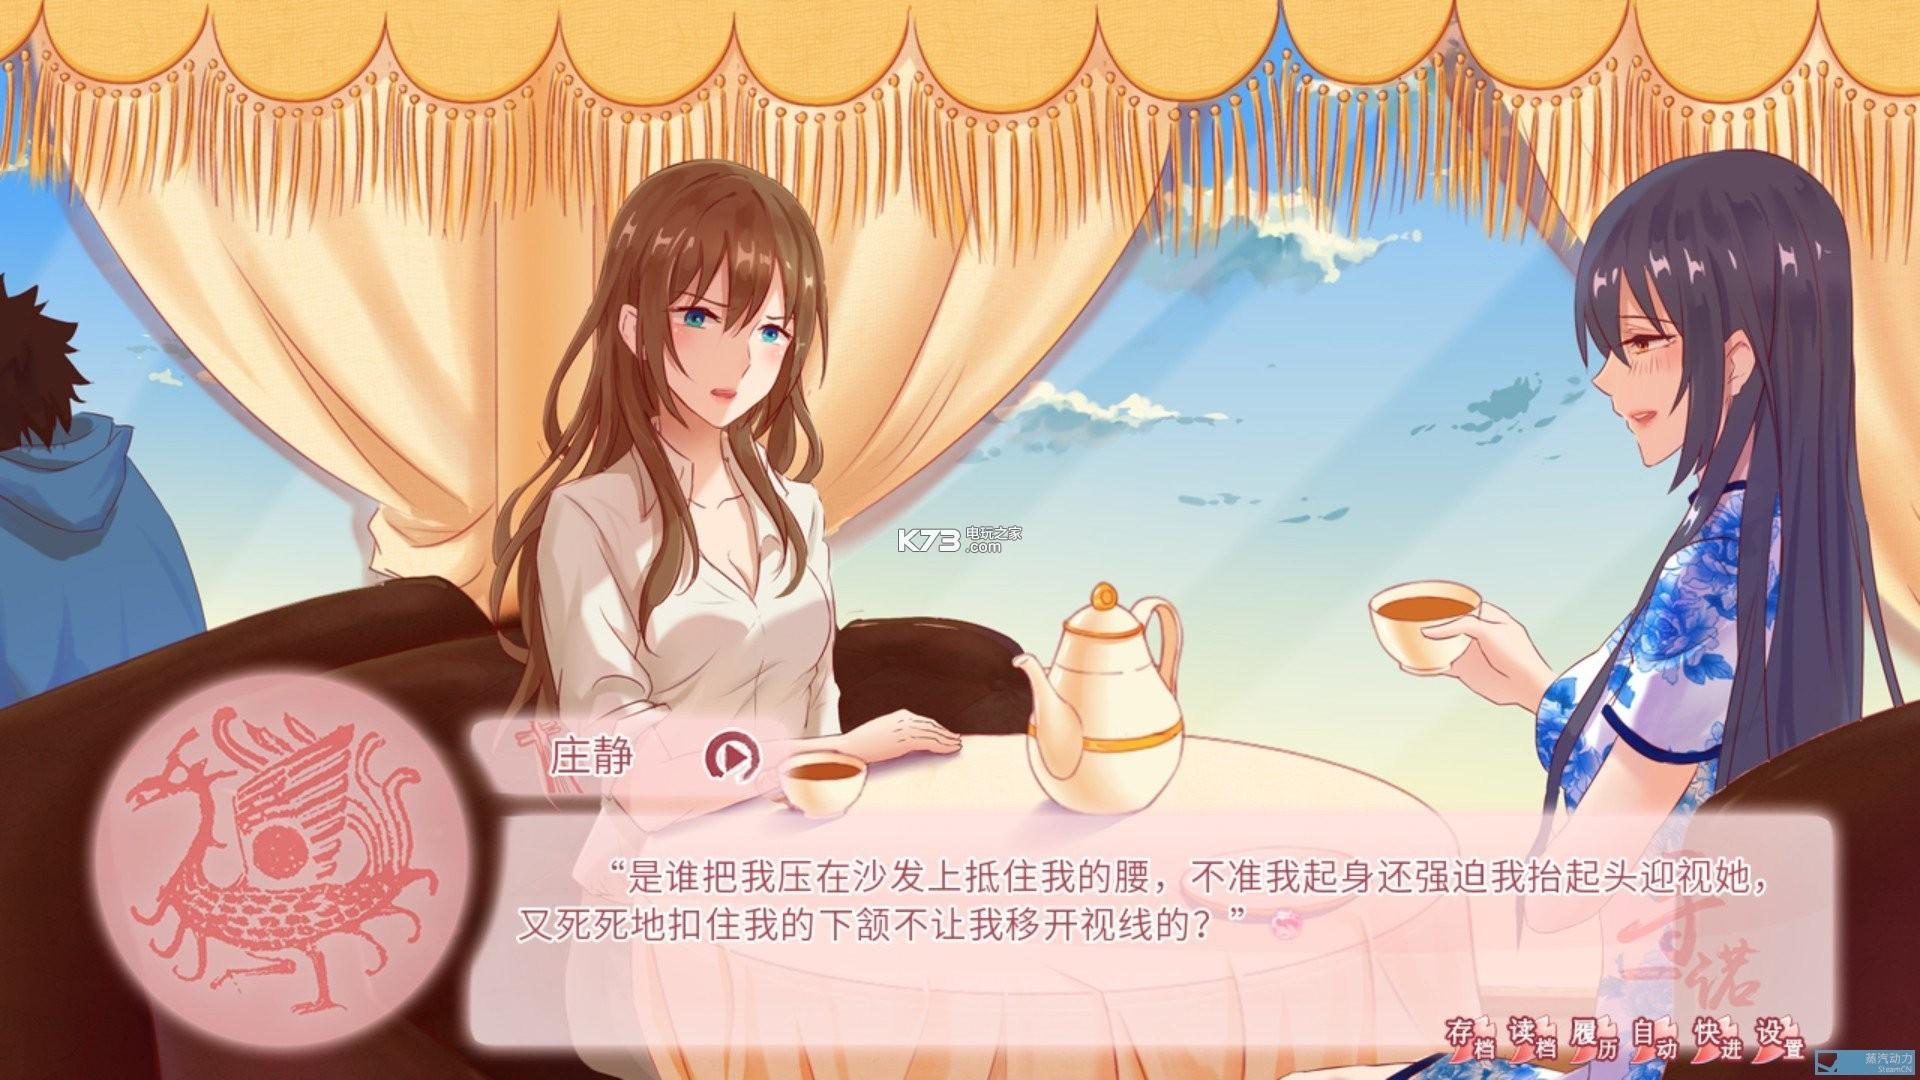 pc 寻诺官网下载 寻诺steam版下载 _k73电玩之